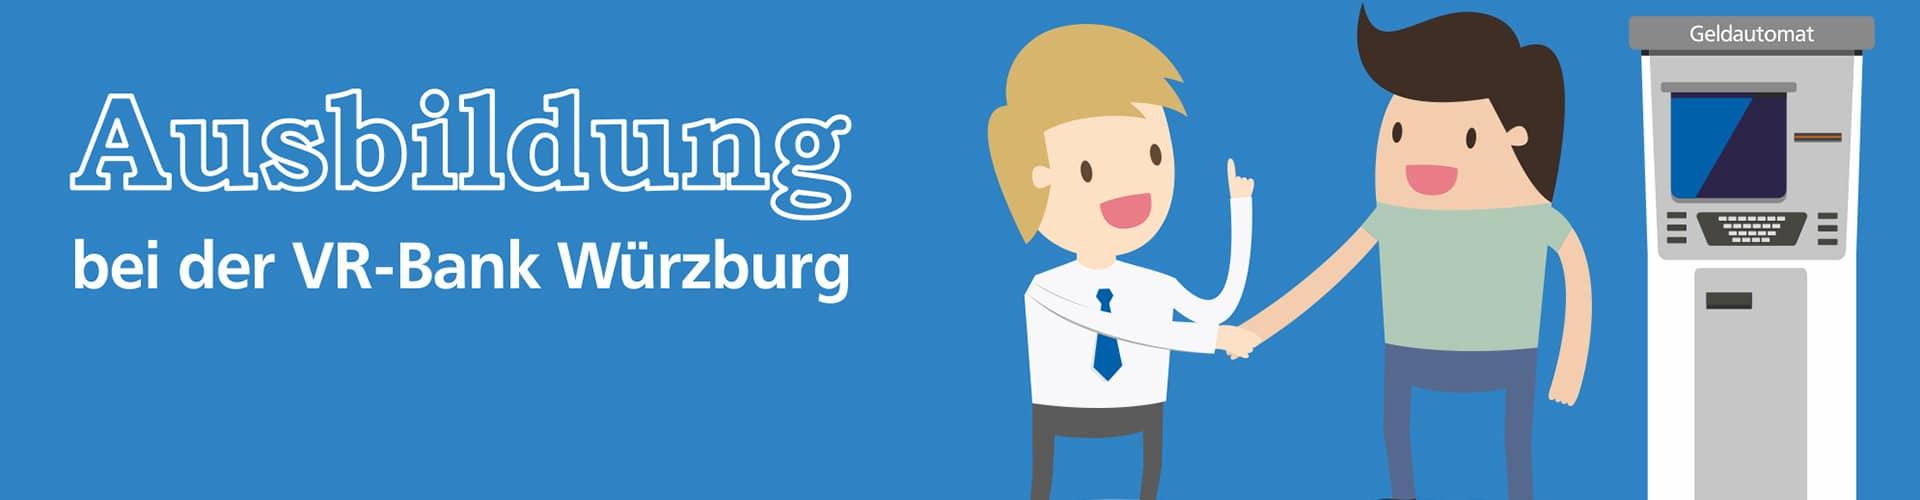 VR Bank Wuerzburg